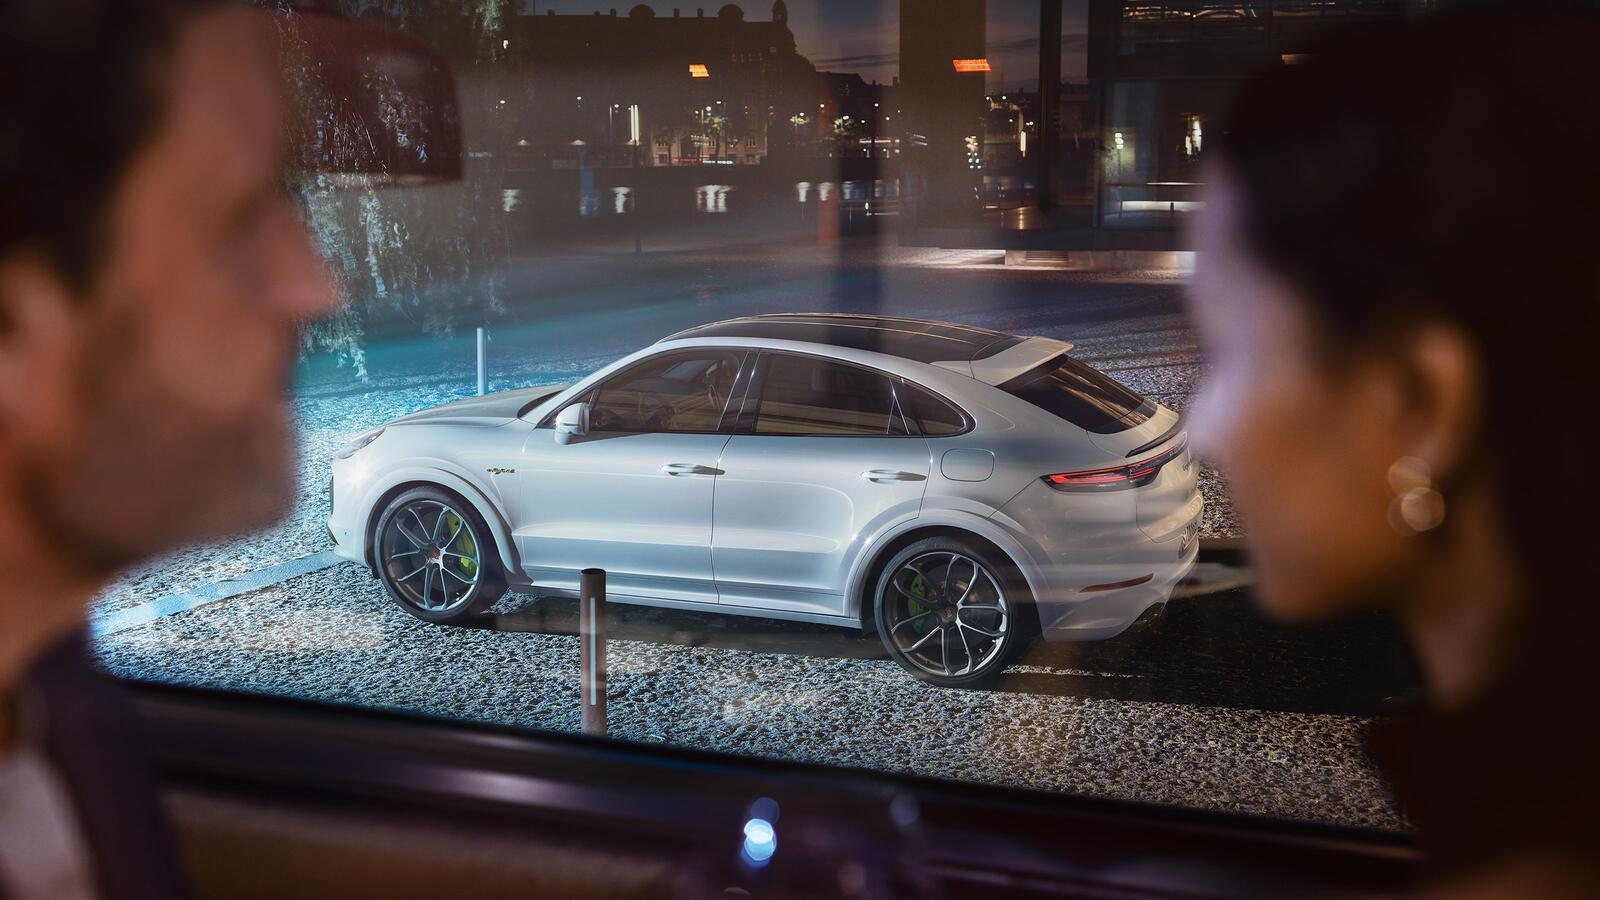 Porsche - Cayenne Turbo S E-Hybrid Coupé - Форма определена содержанием.